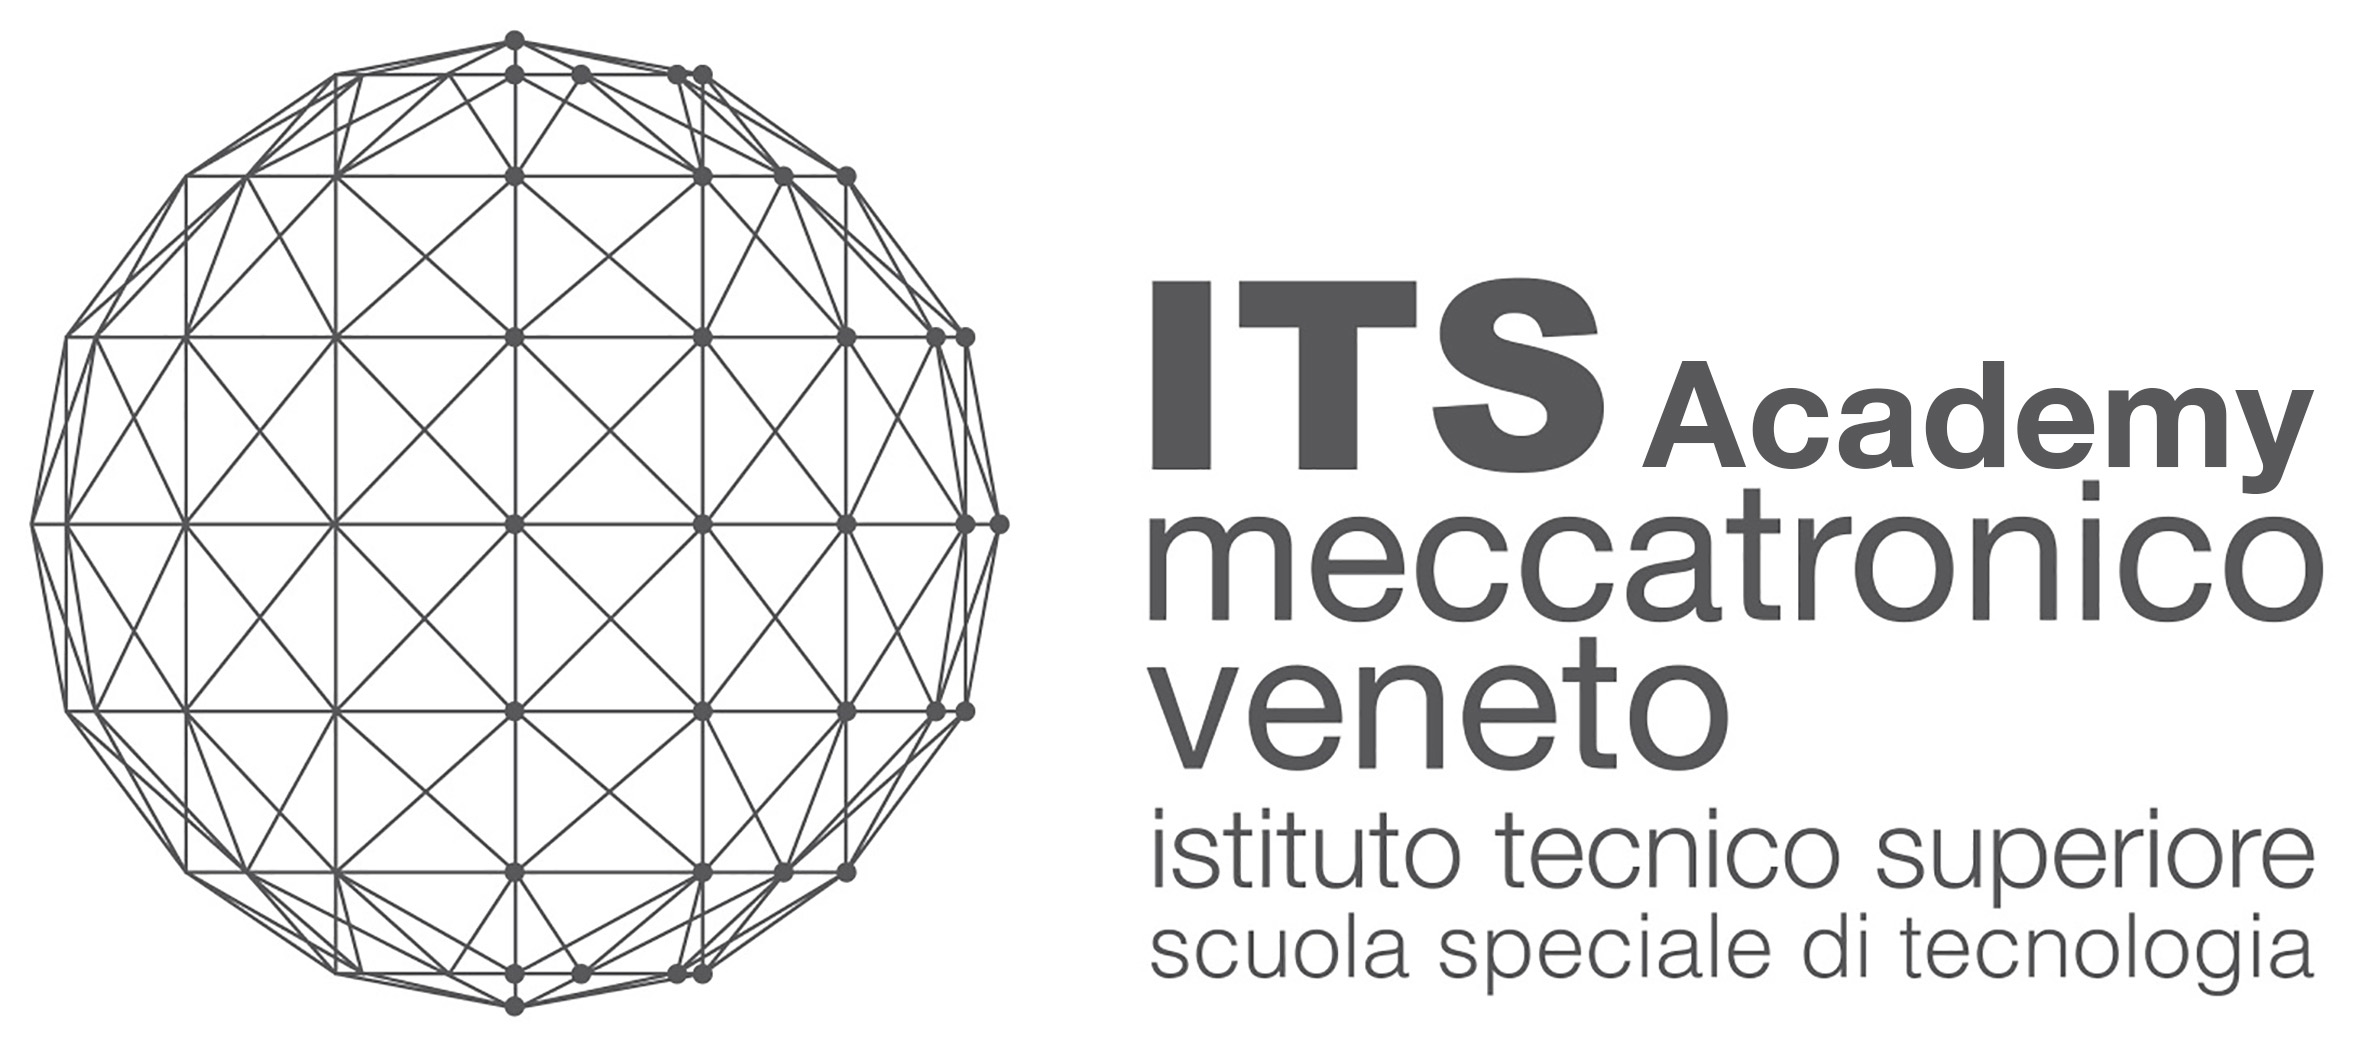 ITS Academy Meccatronico Veneto